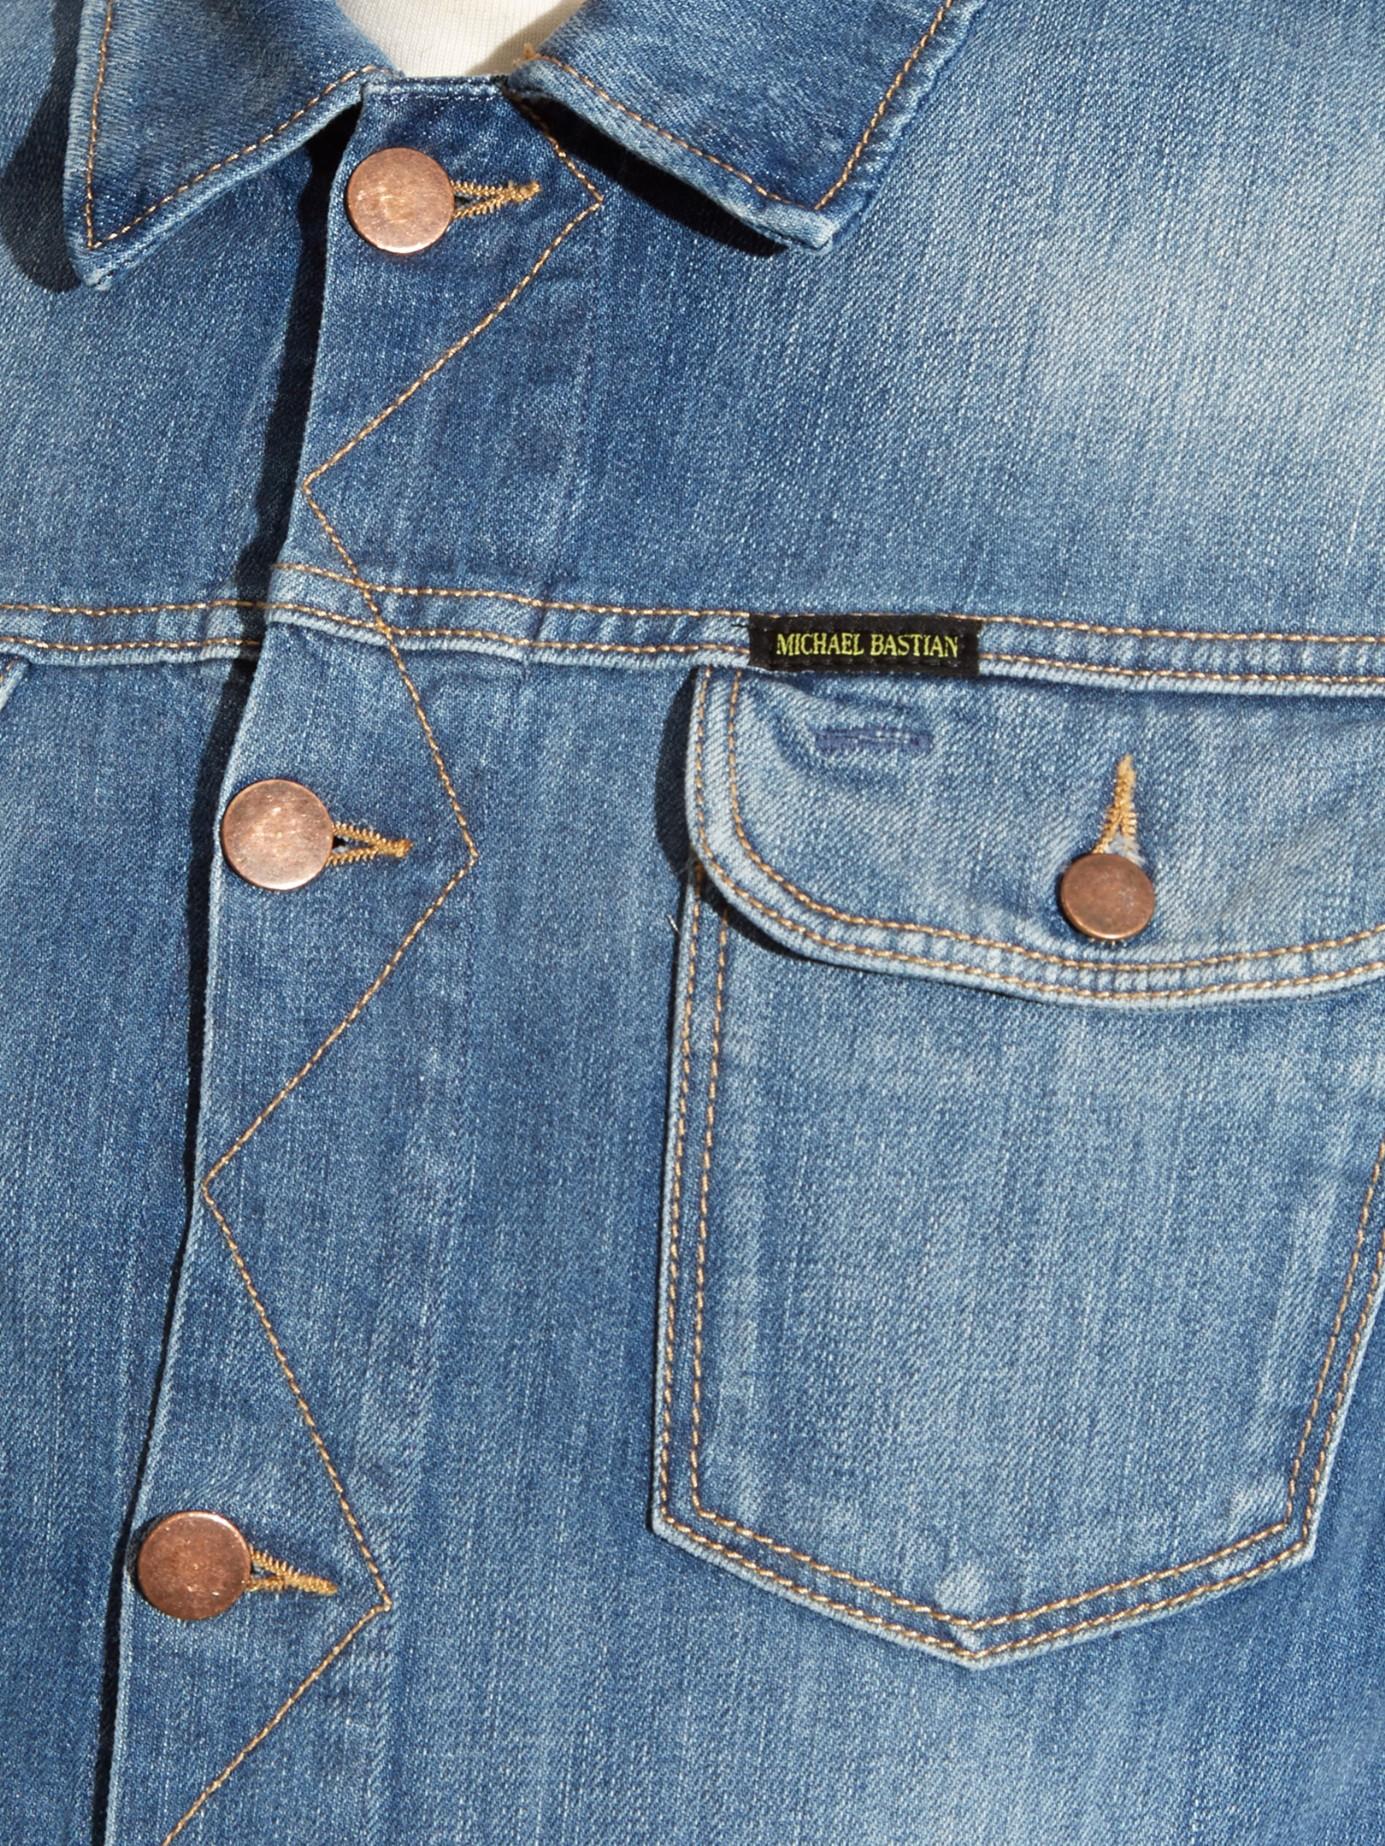 Michael Bastian Patch Pockets Denim Jacket In Blue For Men